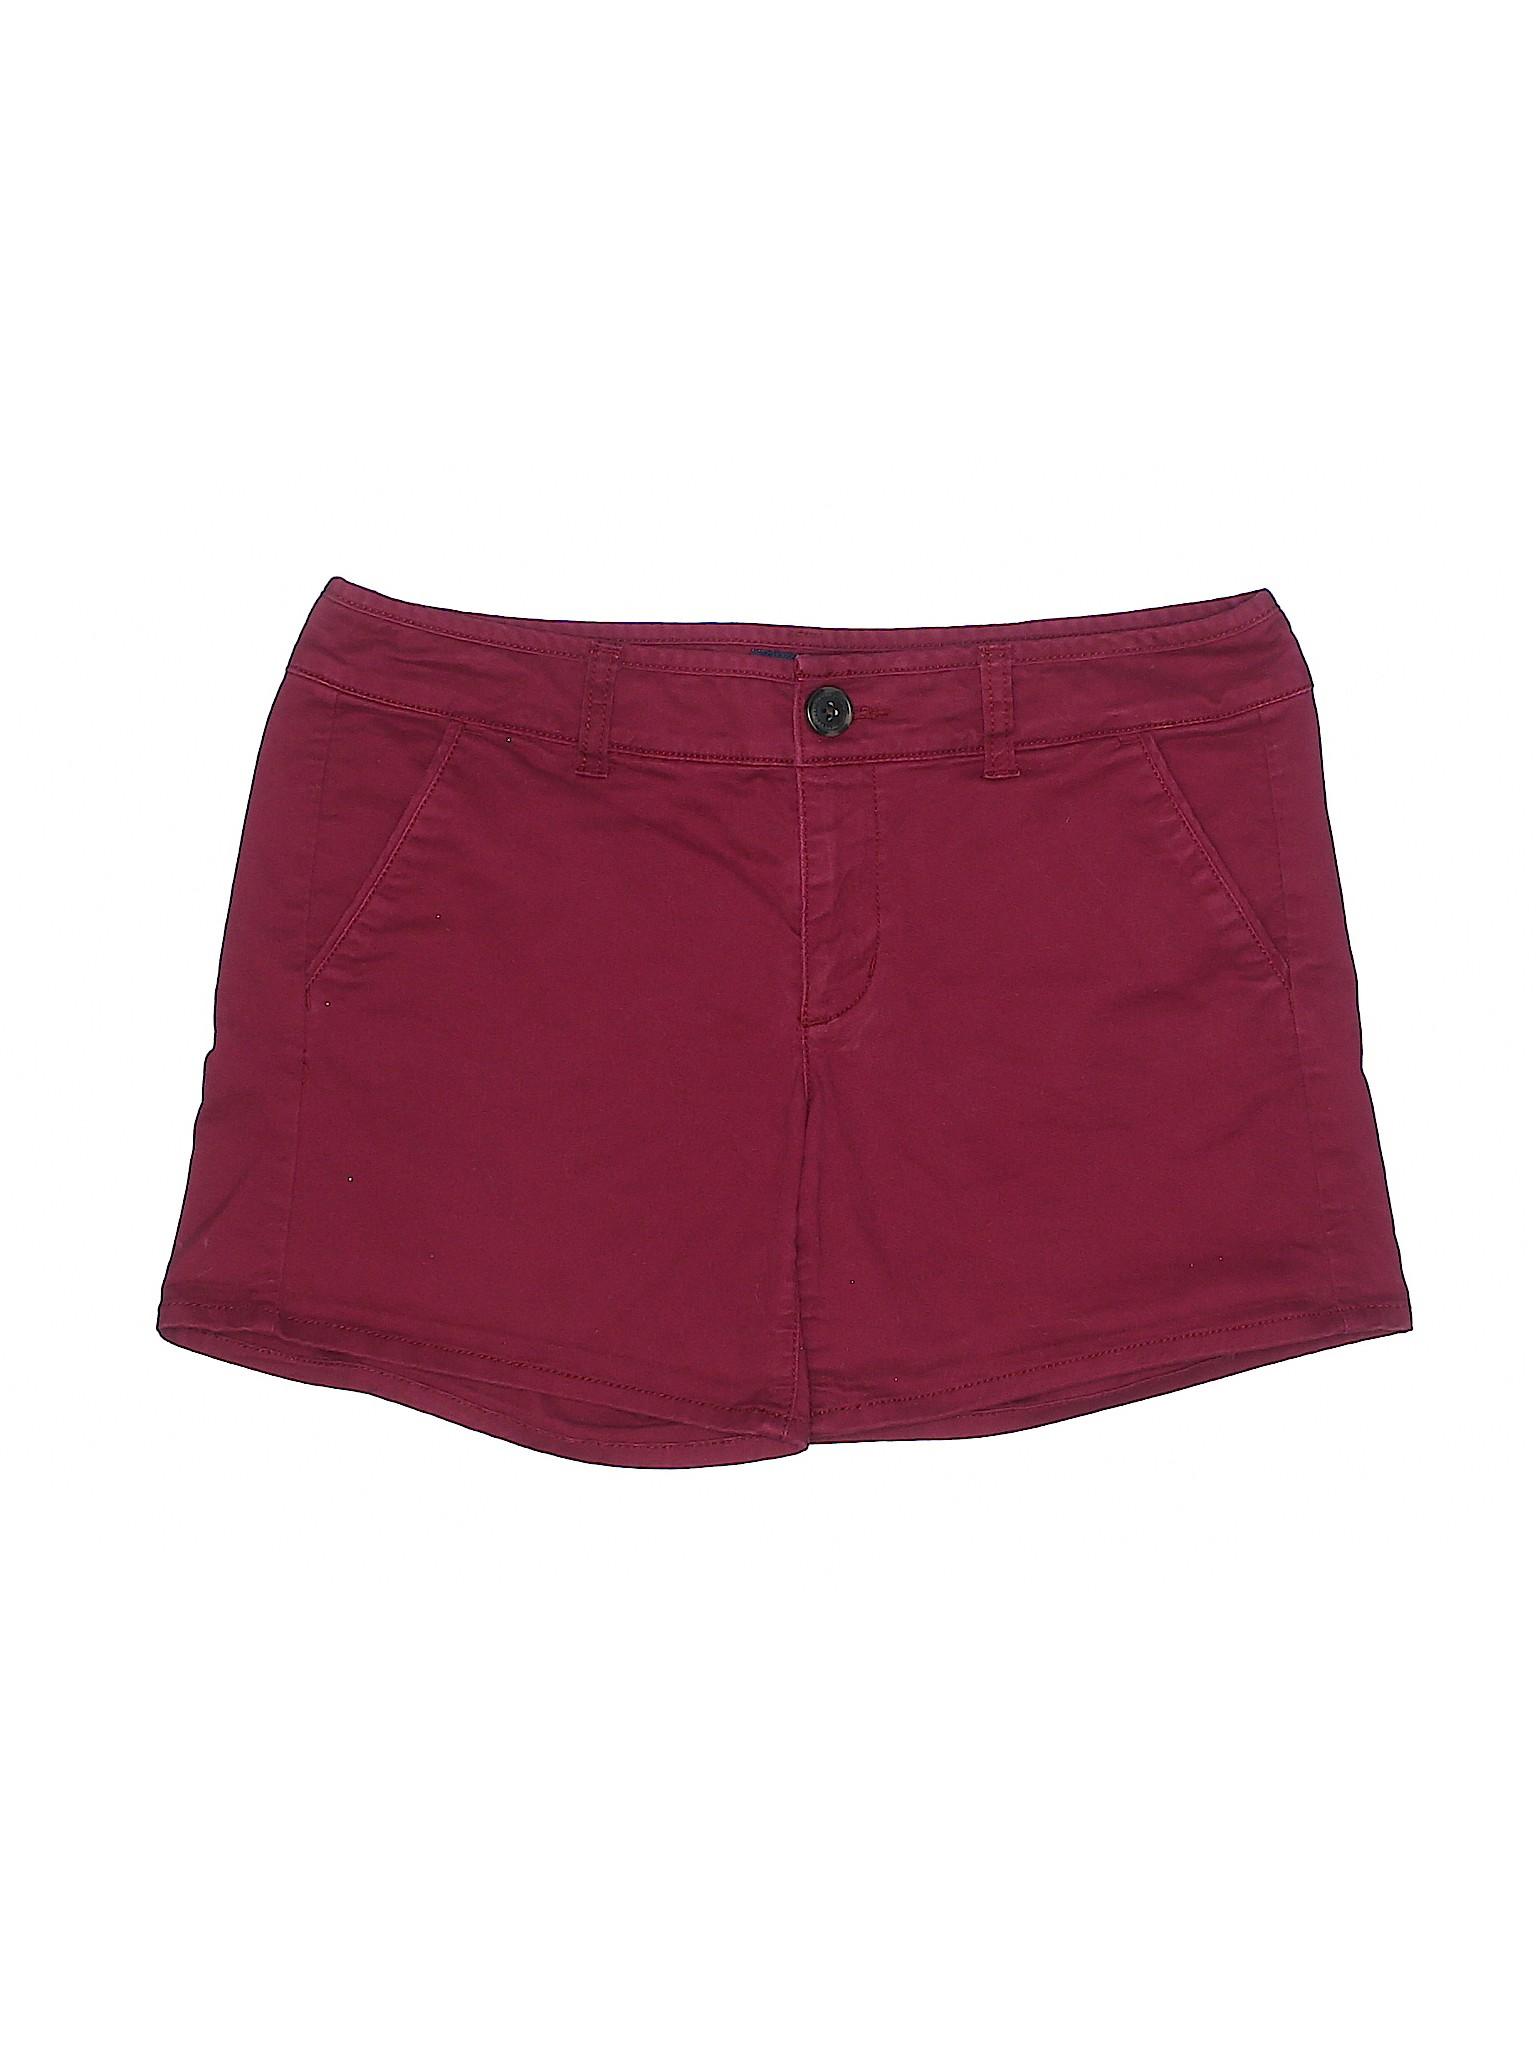 Khaki Eagle Boutique Outfitters American Shorts 4wxtqqpC